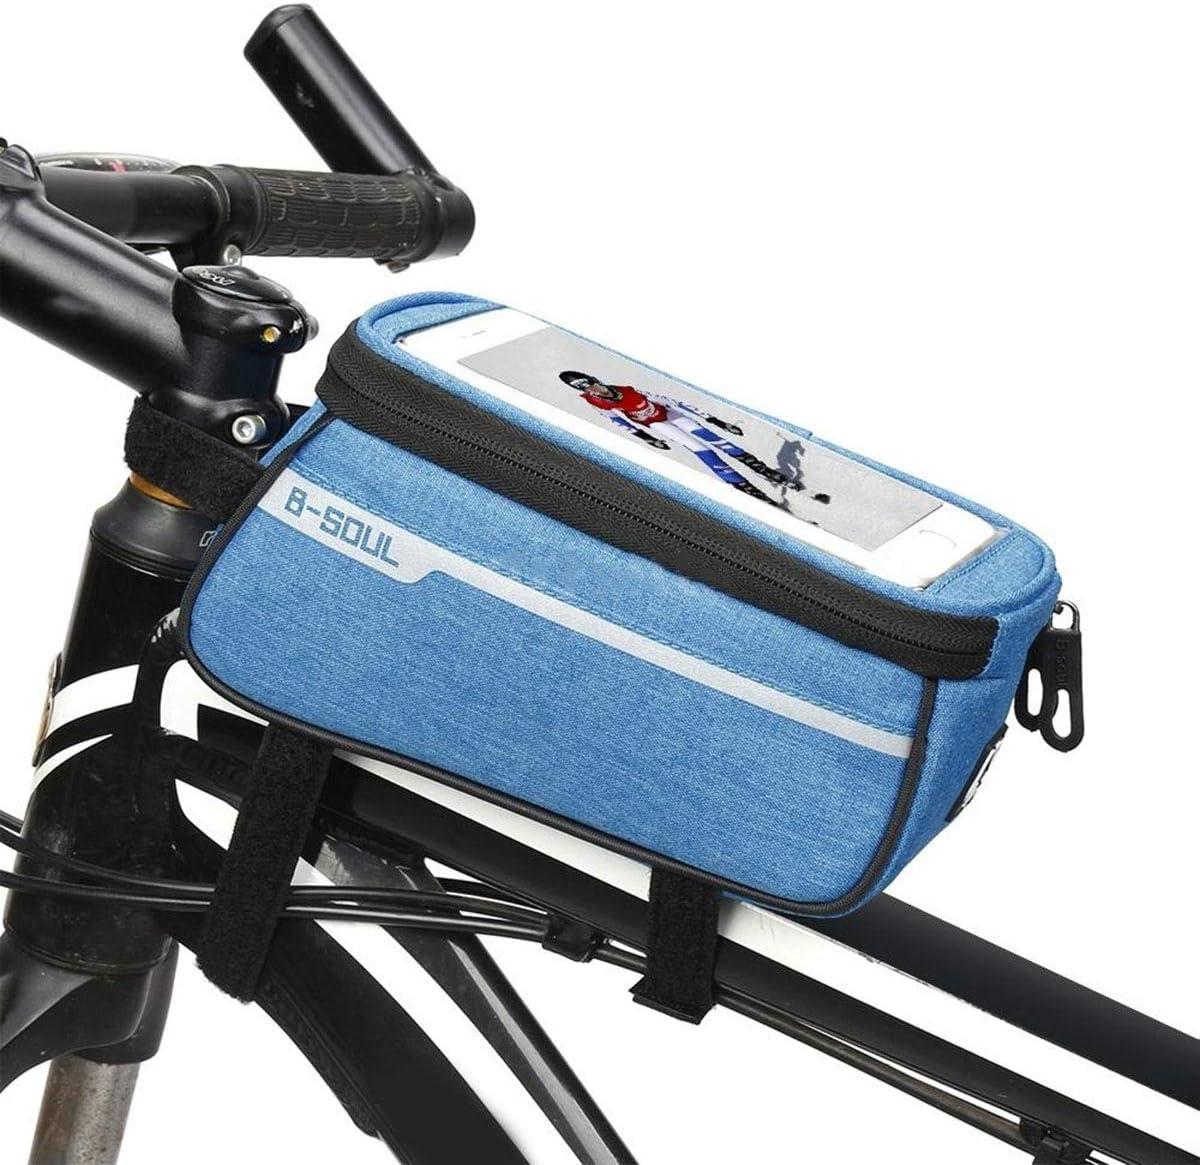 Rojo DaMohony Bolsa de Marco Frontal para Bicicleta Bolsa de Almacenamiento Resistente Al Agua para Tel/éfono M/óvil por Debajo de 6 Tel/éfono de 5 Pulgadas.